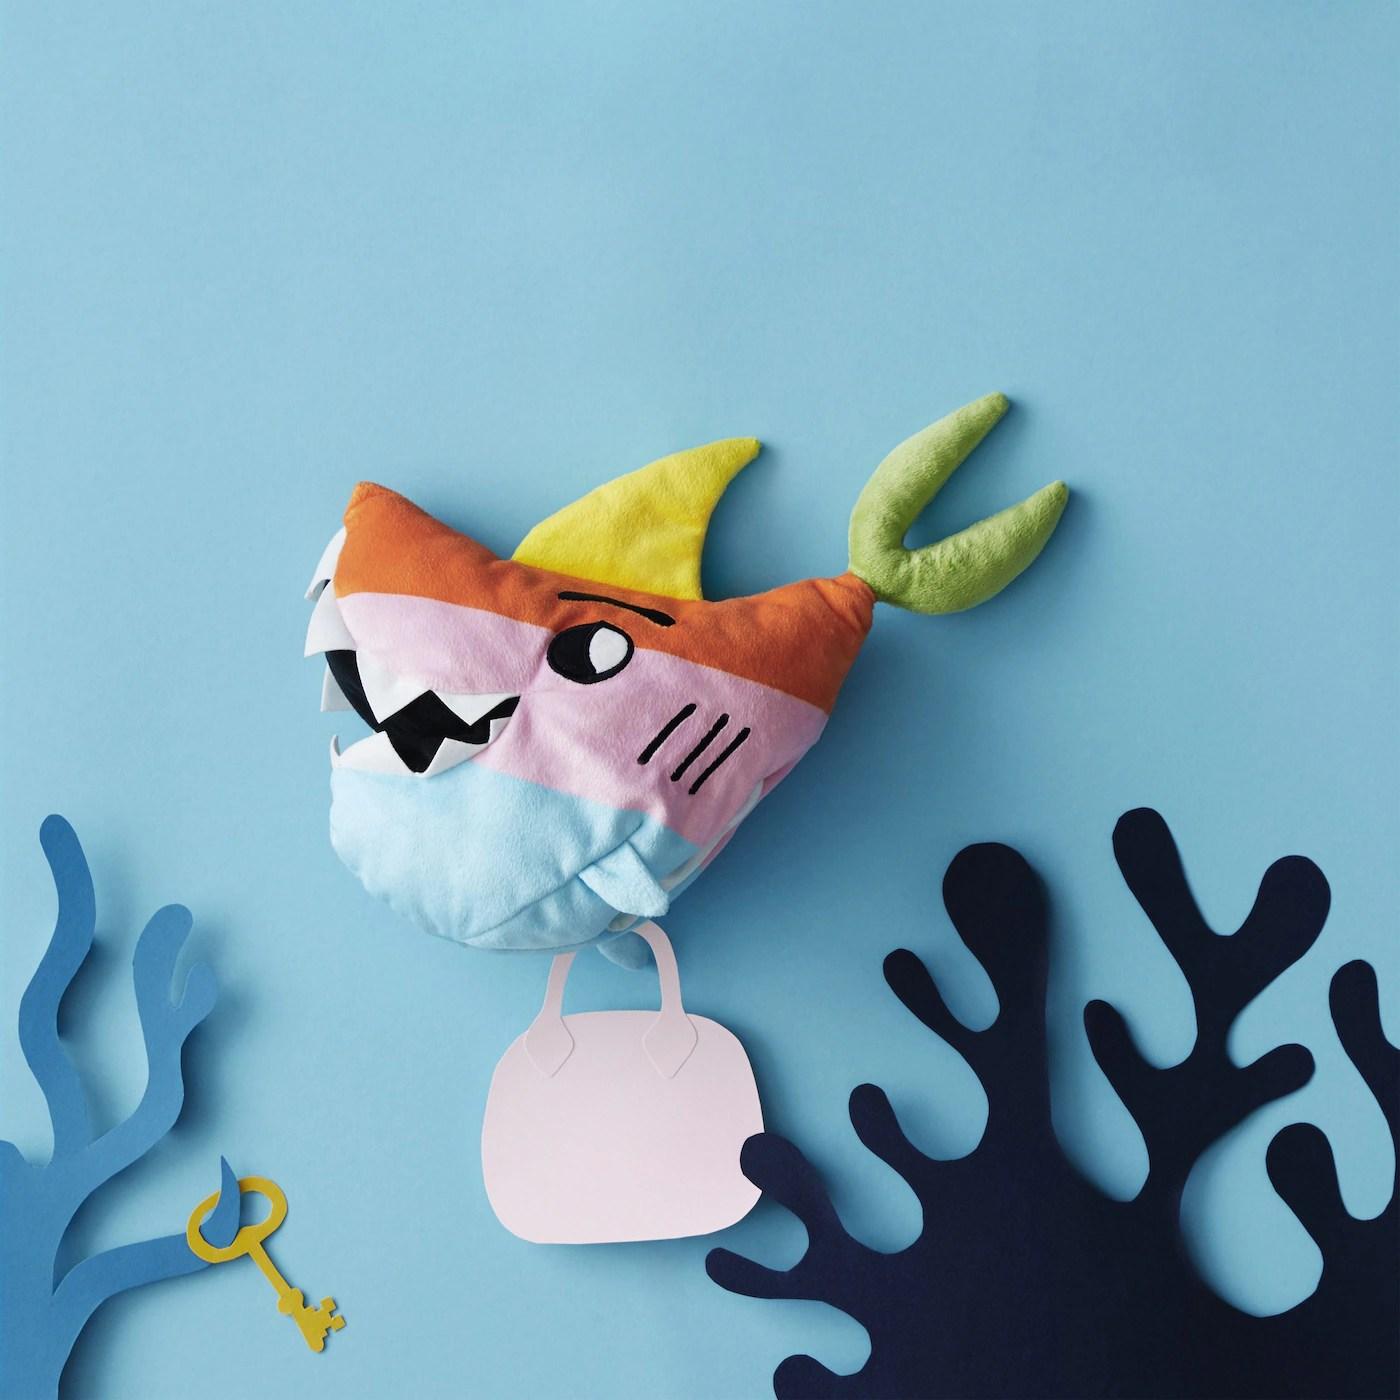 Mobelaufkleber Fur Ikea Slakt Bett Weisser Hai Haie Kat6 Meer Wasser Blau Bed Aufkleber Mobelfolie Tur